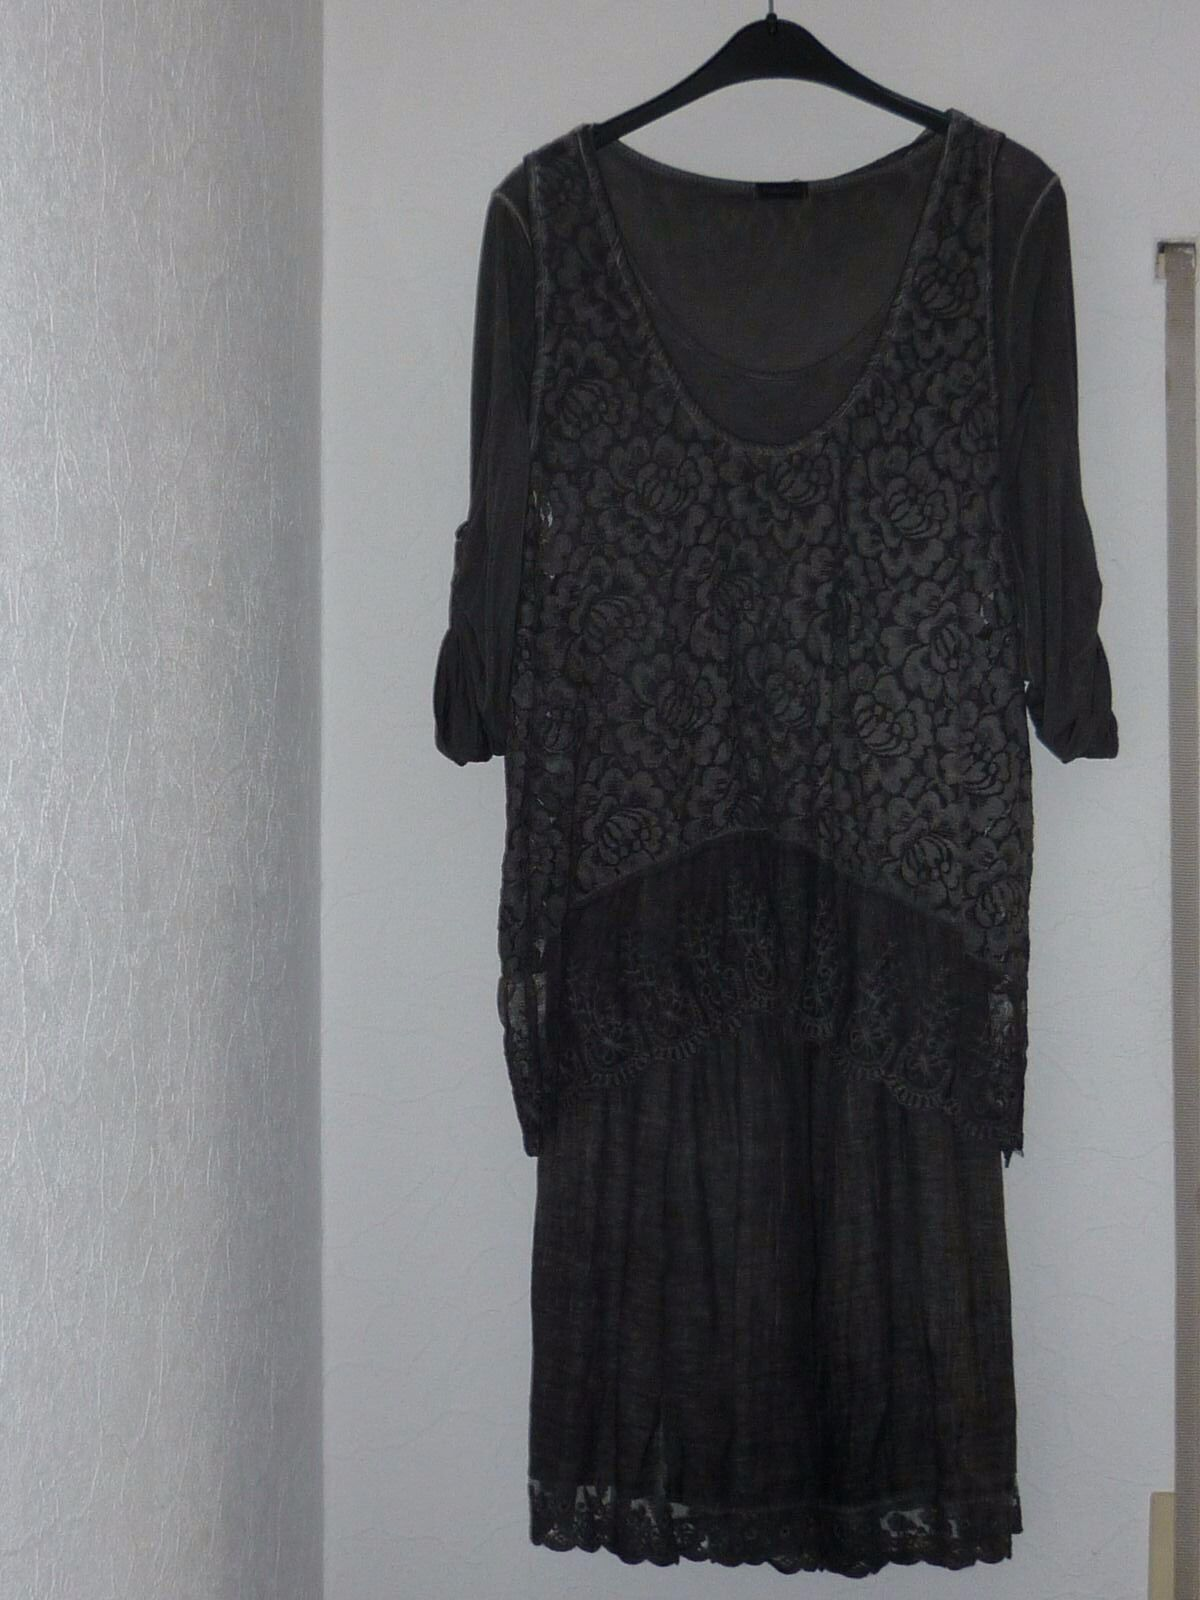 Extravagantes 2-teiliges Kleid in dunkelgrau, Gr. M, 38, Made in , neu